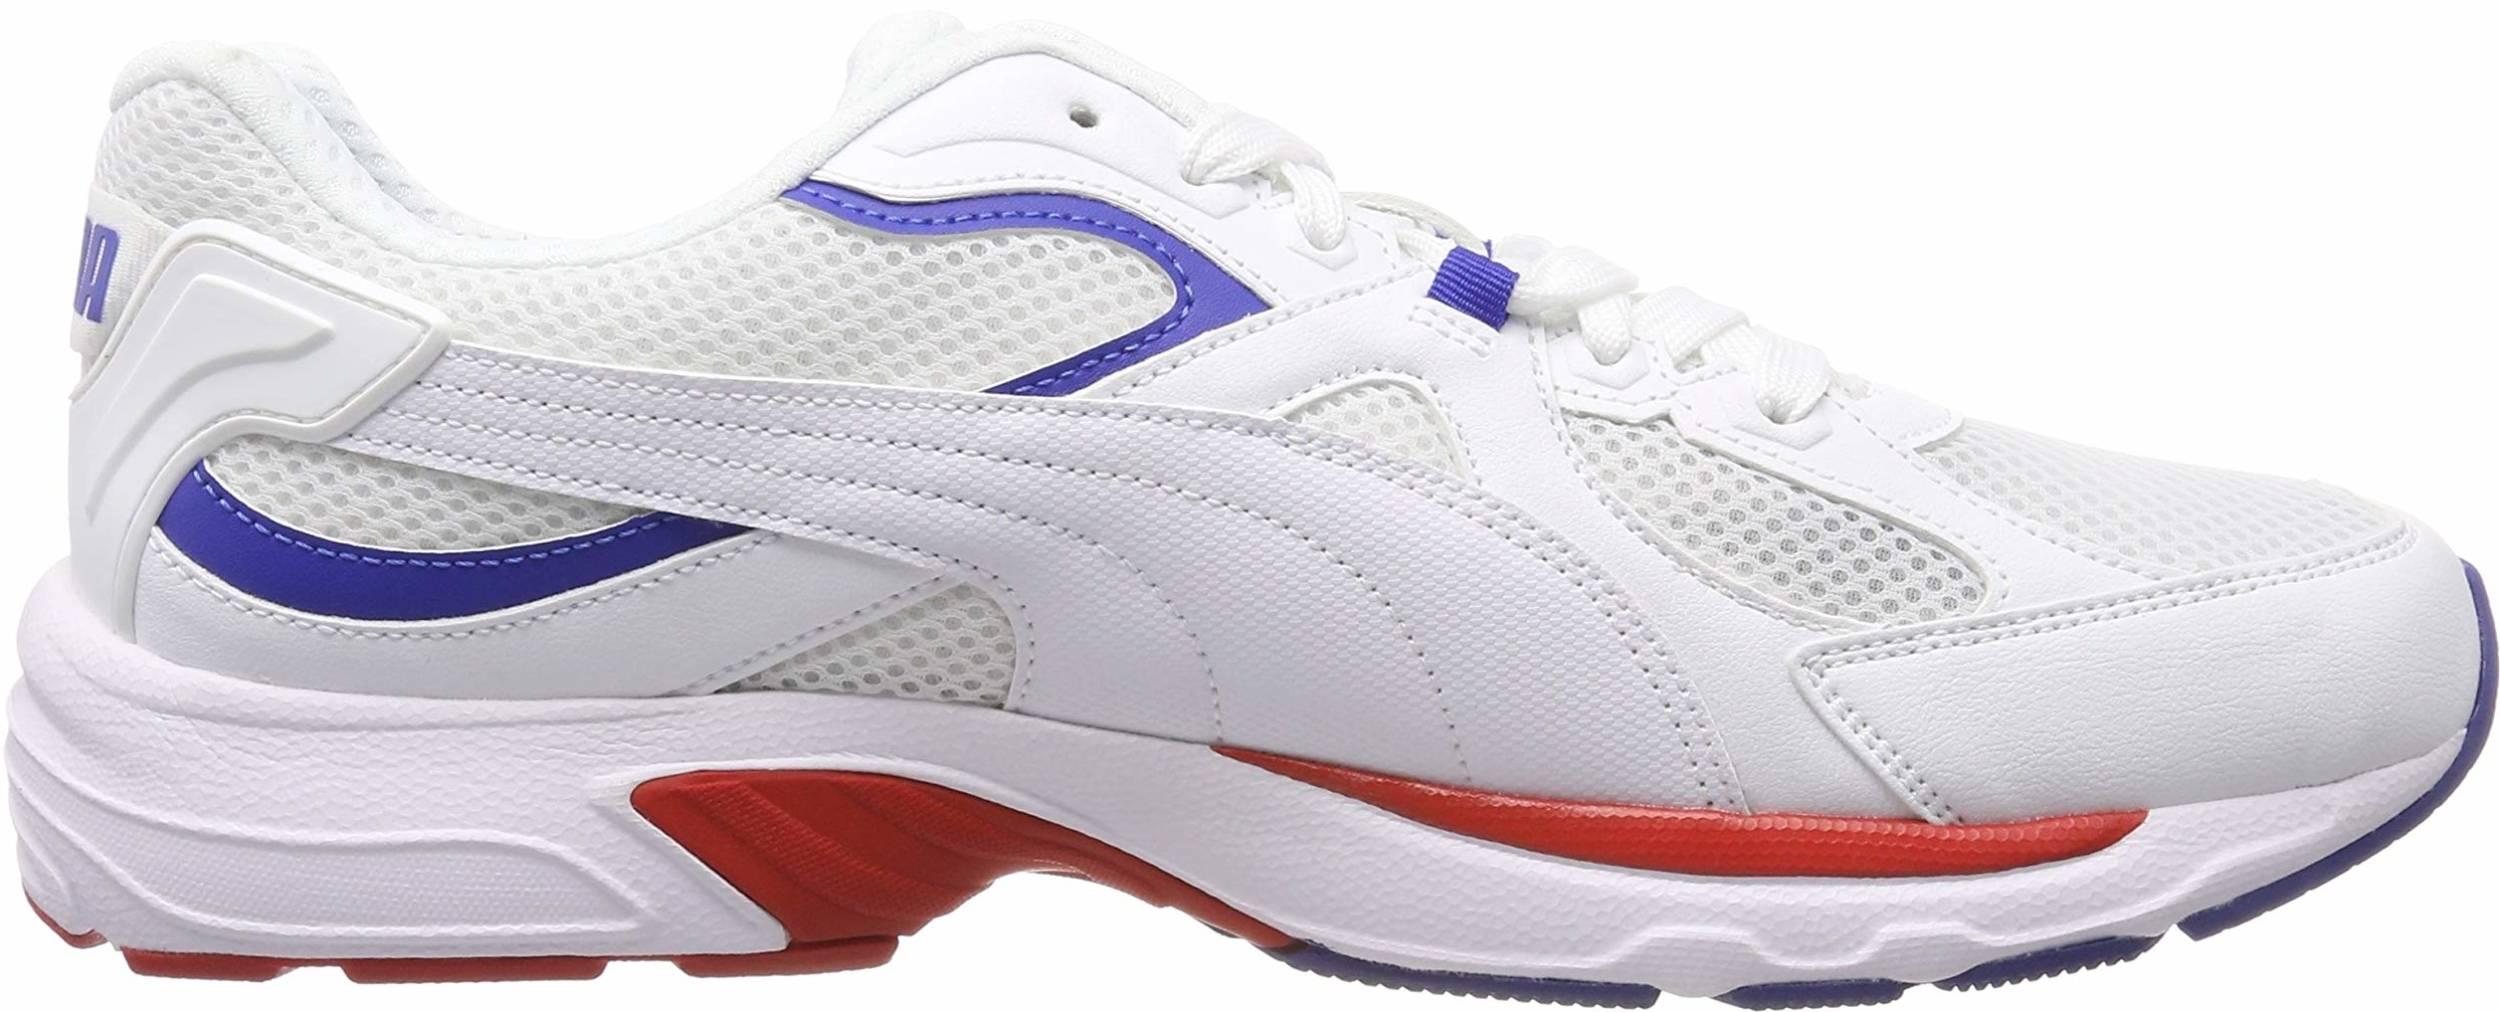 telegrama mensaje una vez  Puma Axis Plus 90s sneakers (only $25) | RunRepeat